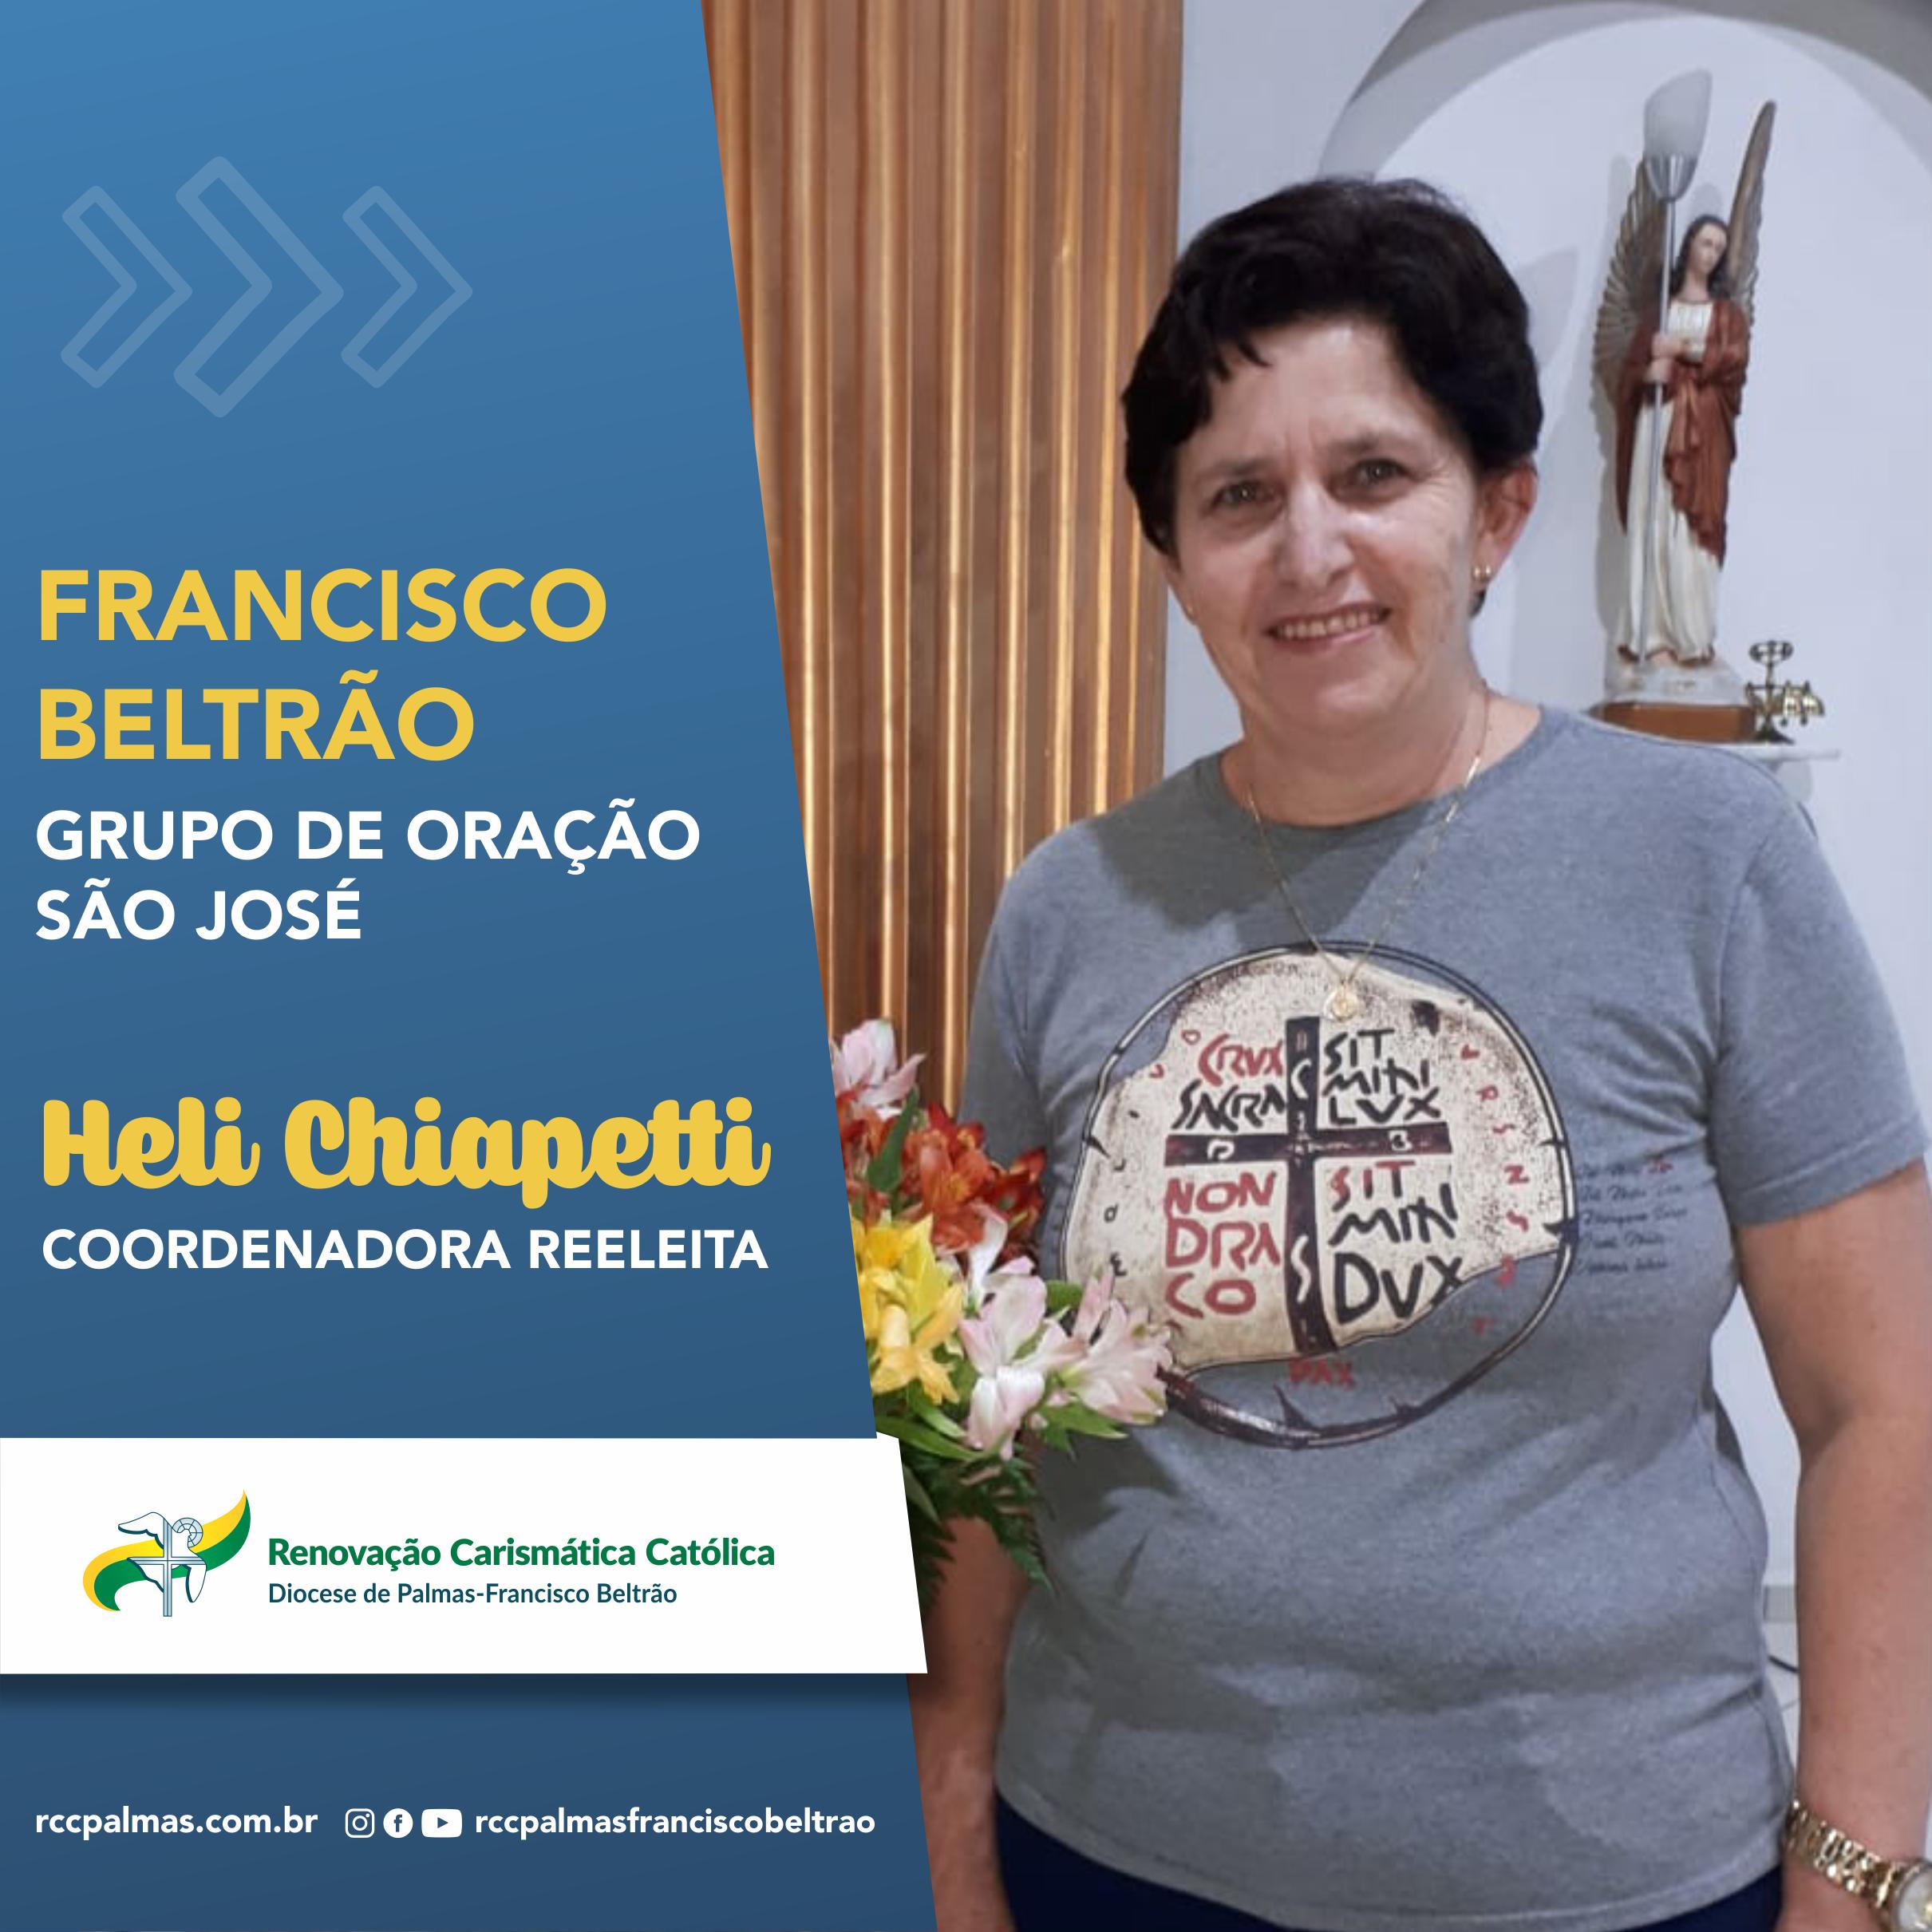 41 FRANCISCO BELTRAO - SAO JOSE